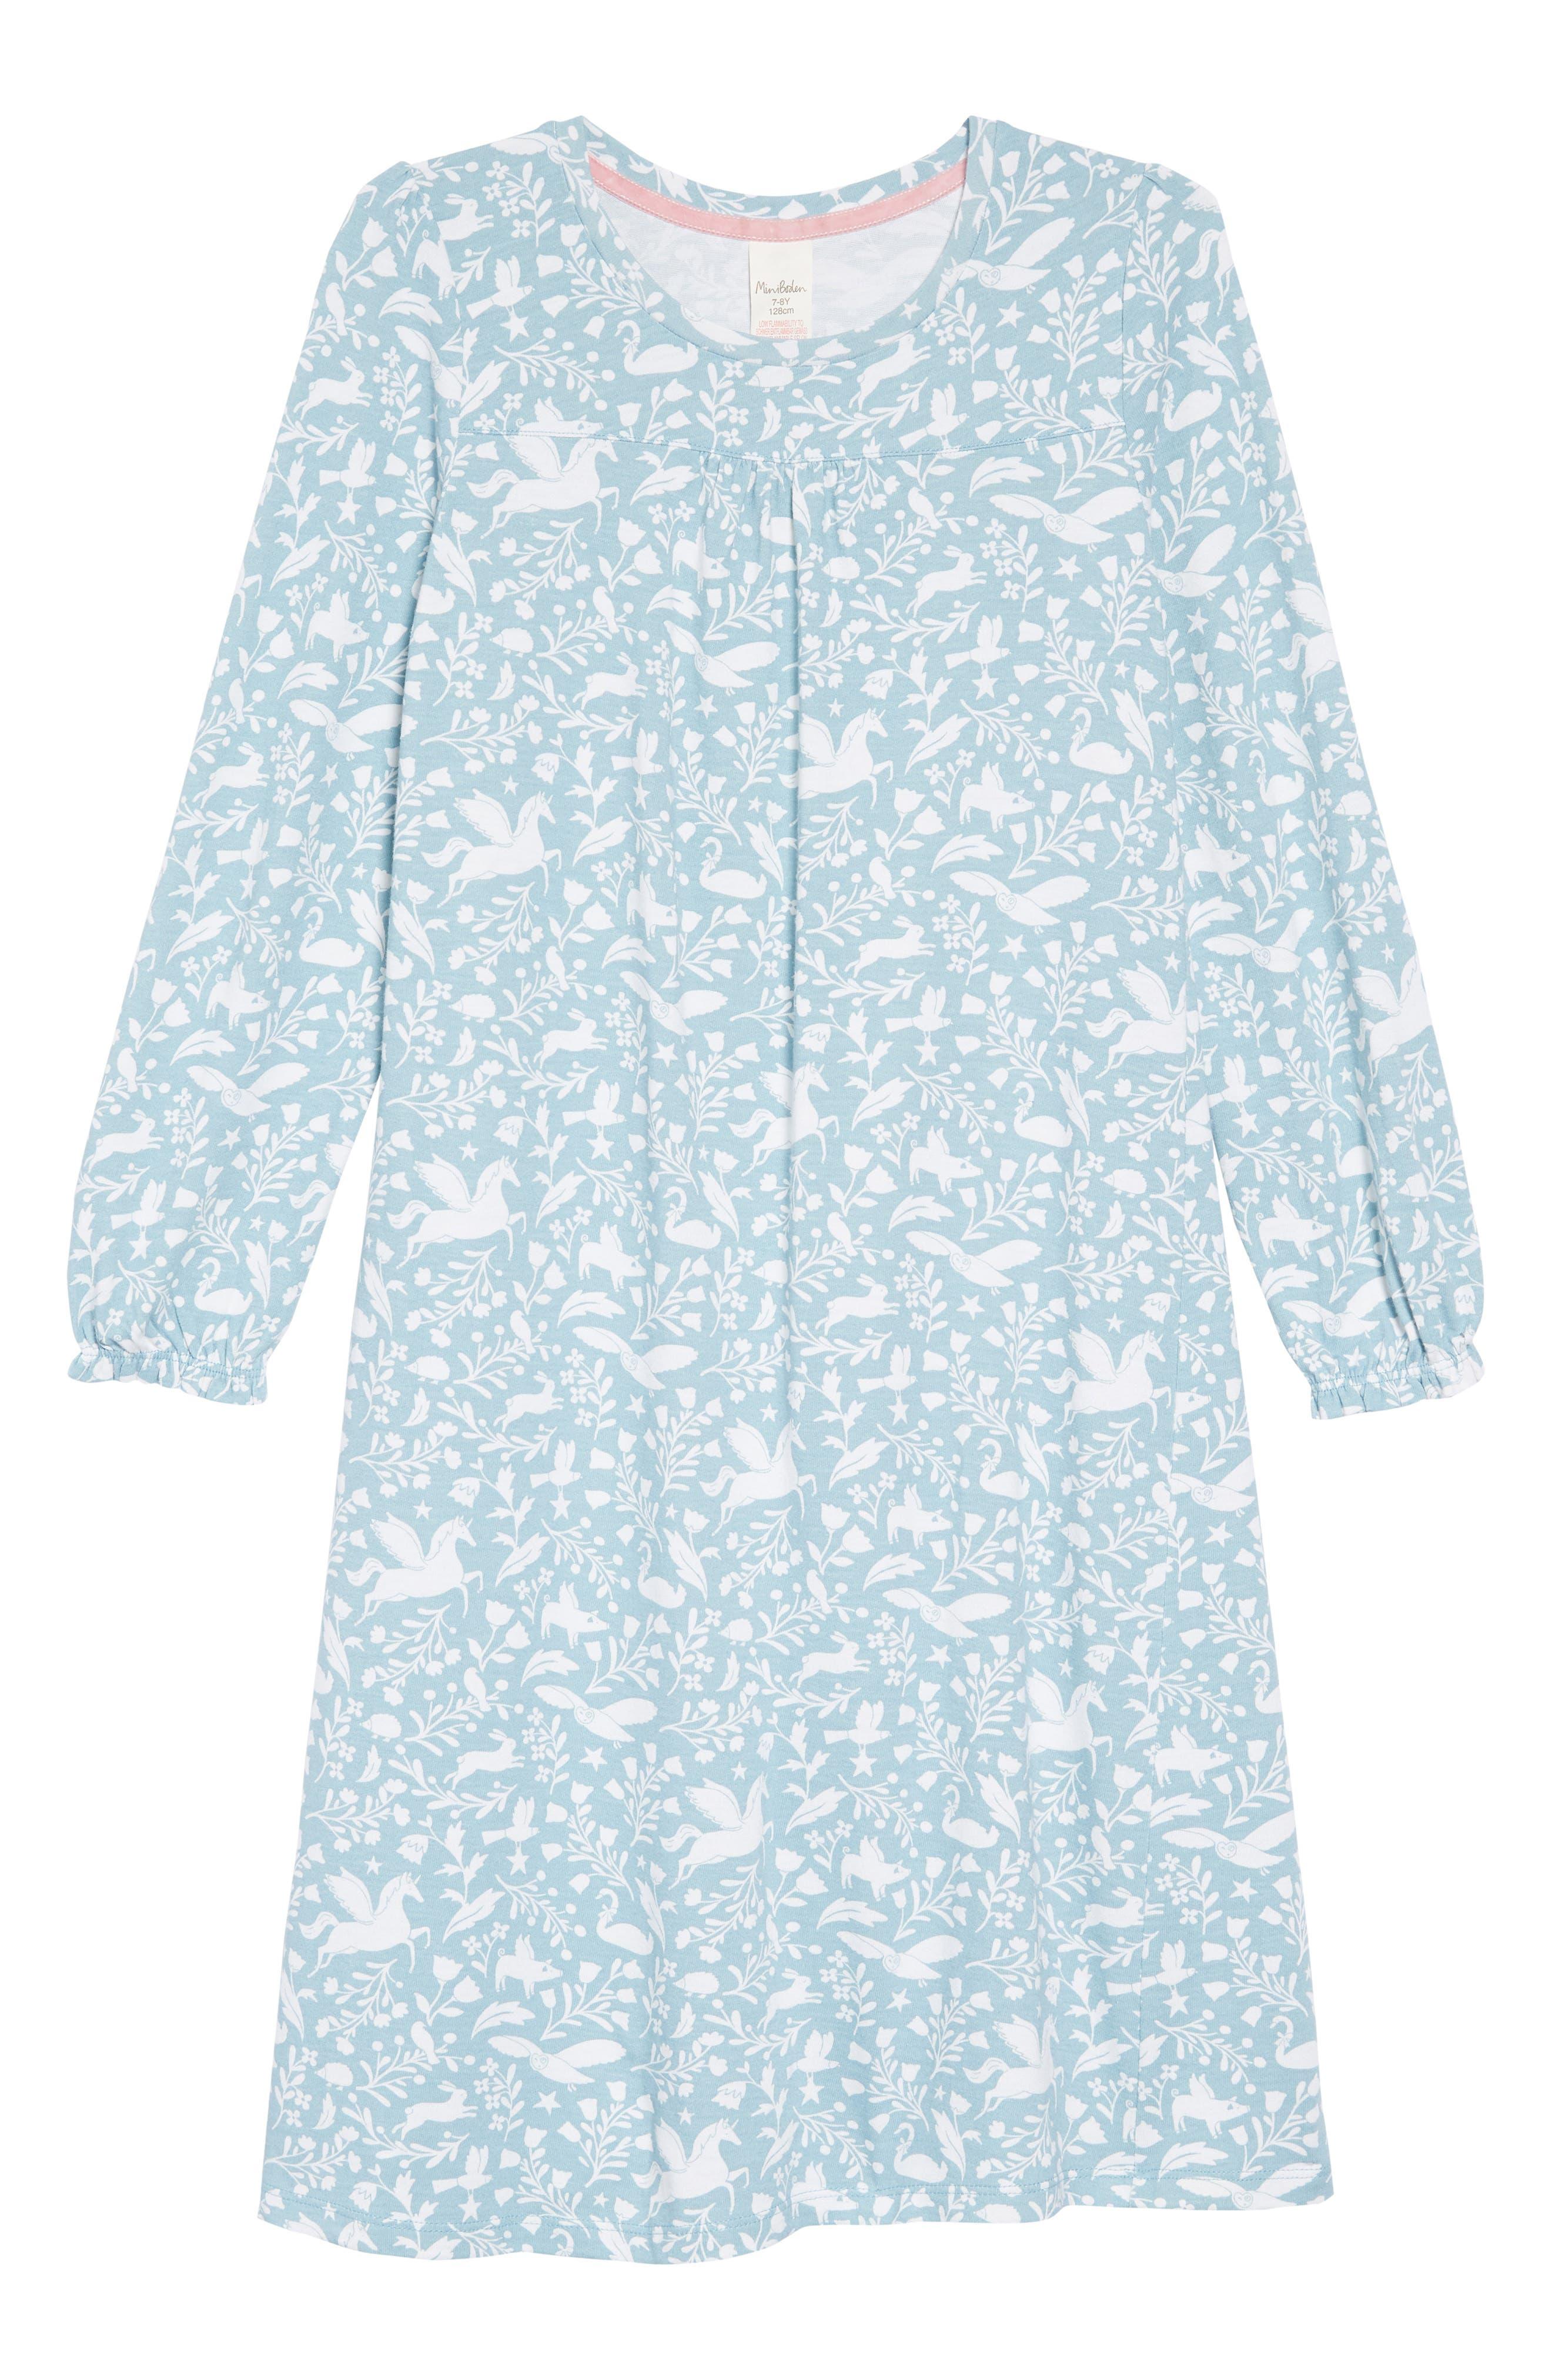 Print Nightgown,                             Main thumbnail 1, color,                             BLU ICE BLUE PECULIA